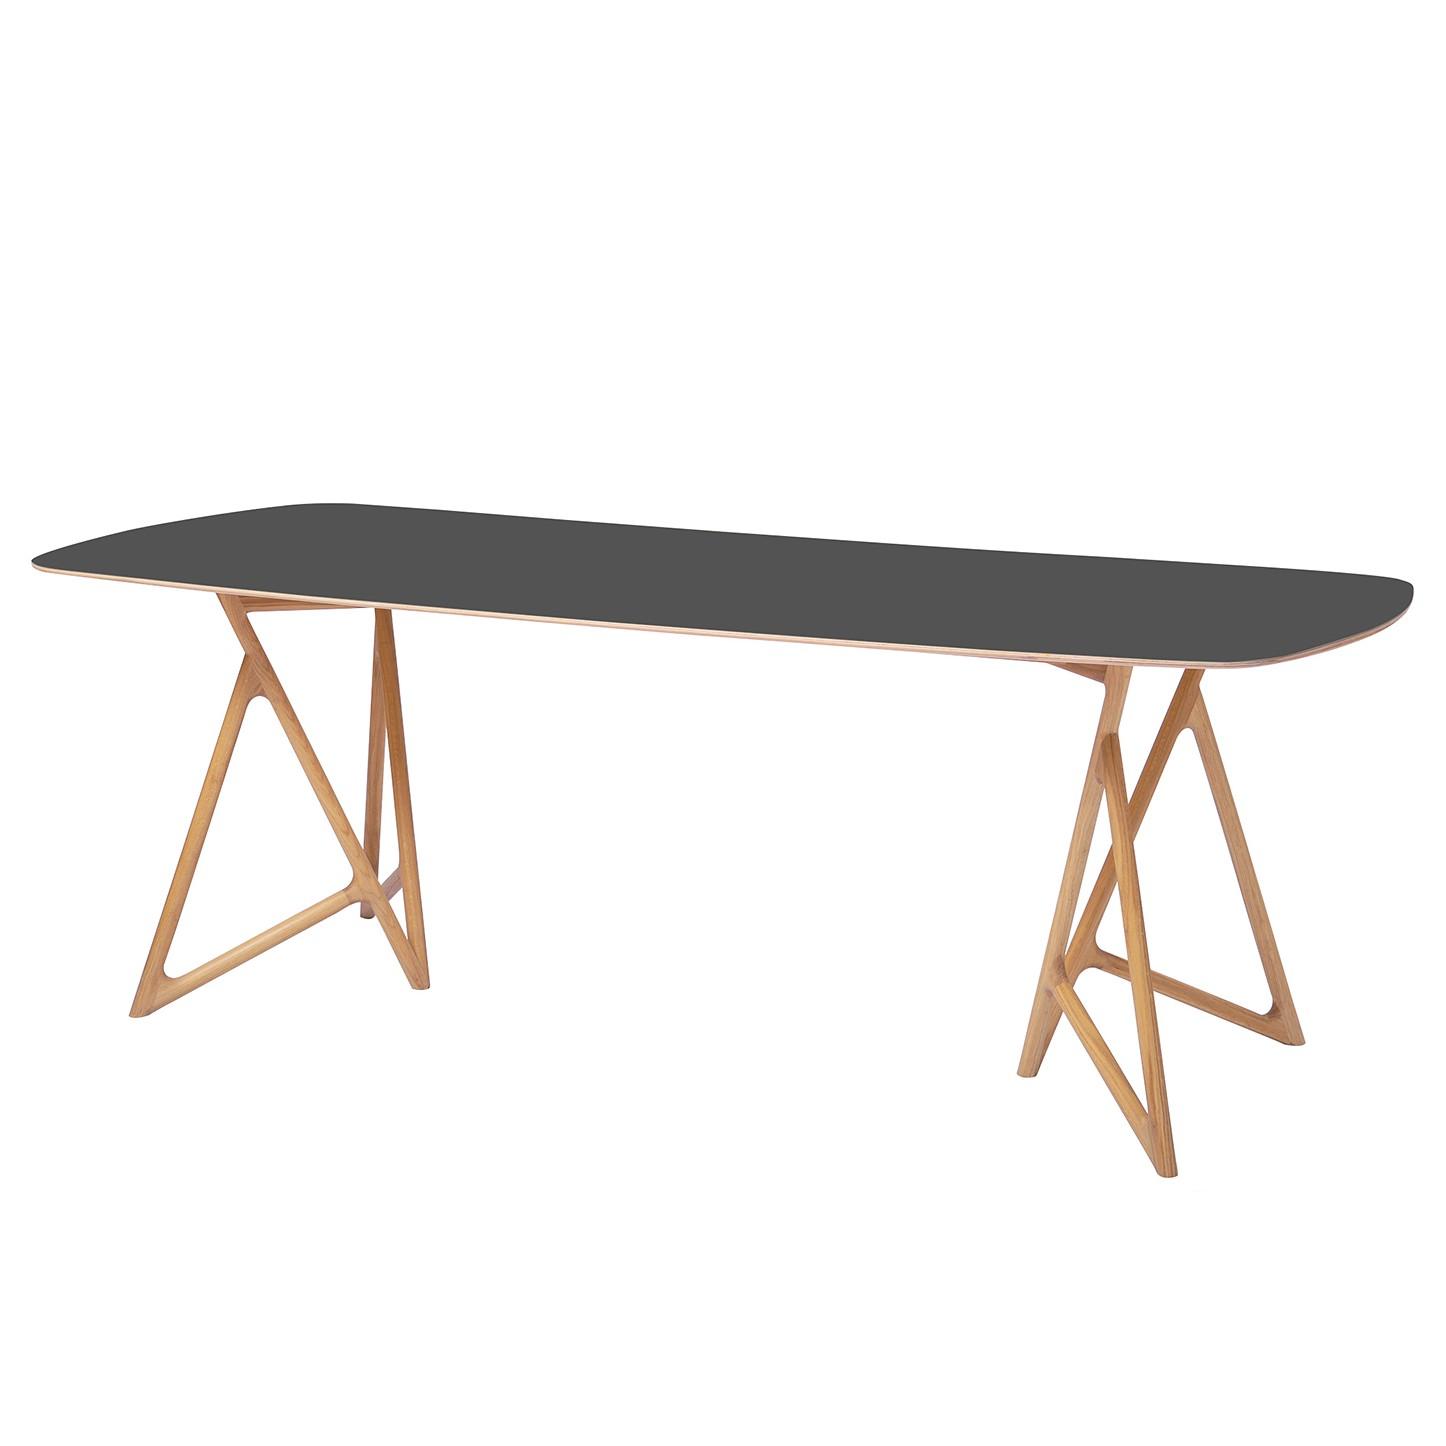 Table à manger Koza - Chêne massif / Linoléum - Anthracite / Chêne - 160 x 90 cm, Studio Copenhagen